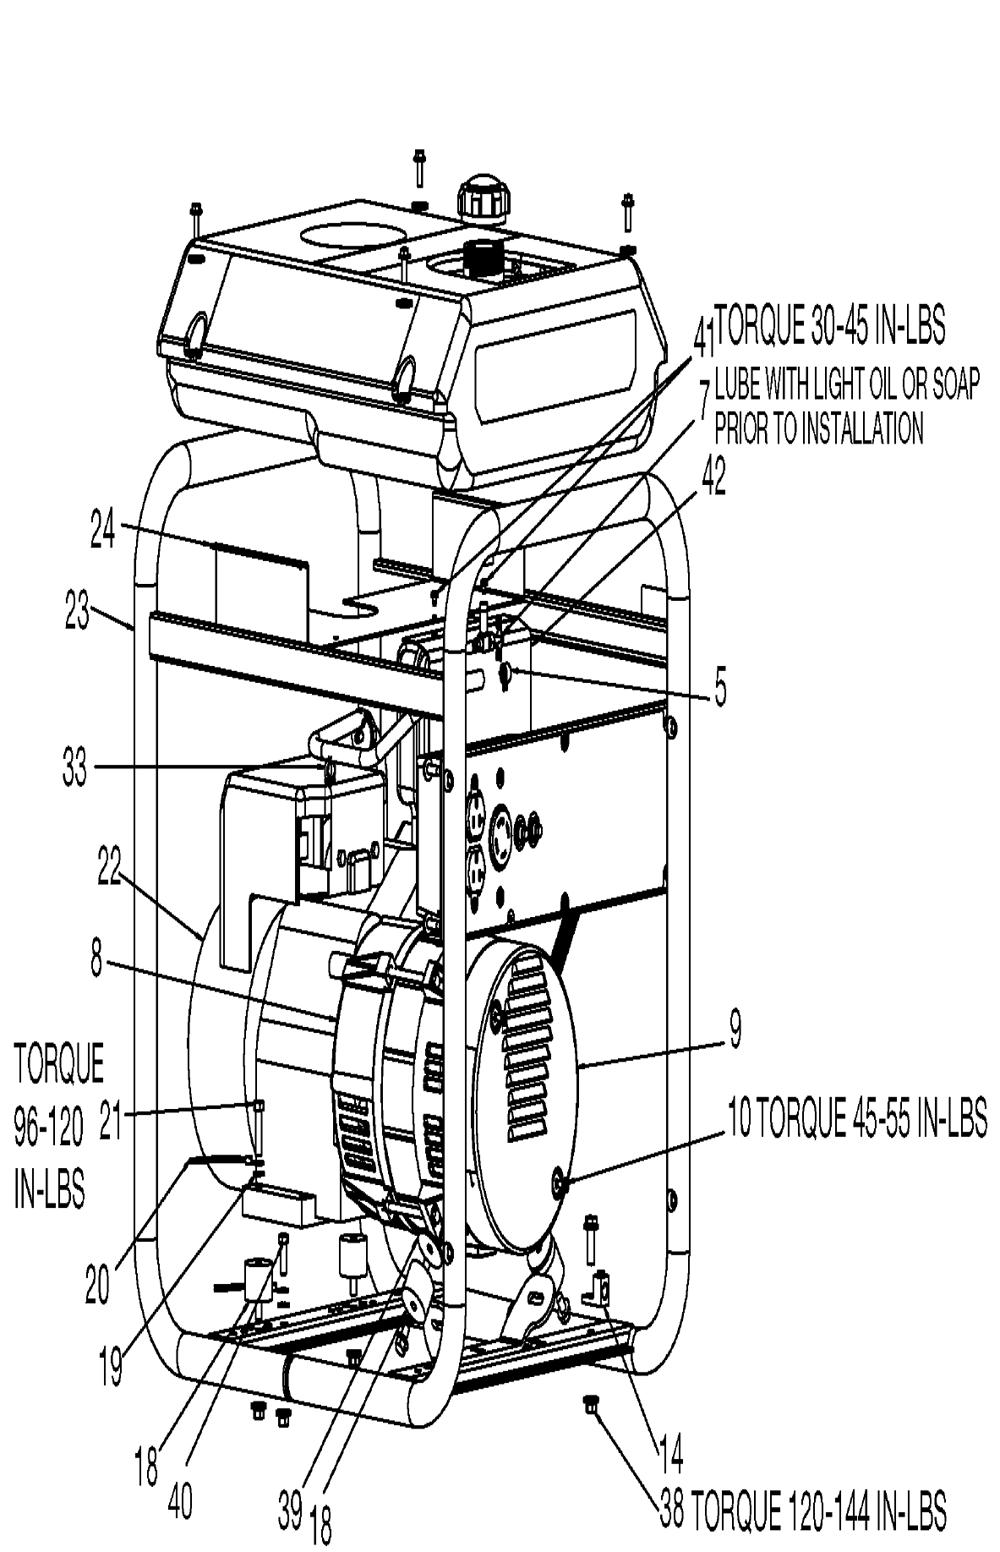 BSI525-W-portercable-T1-PB-1Break Down